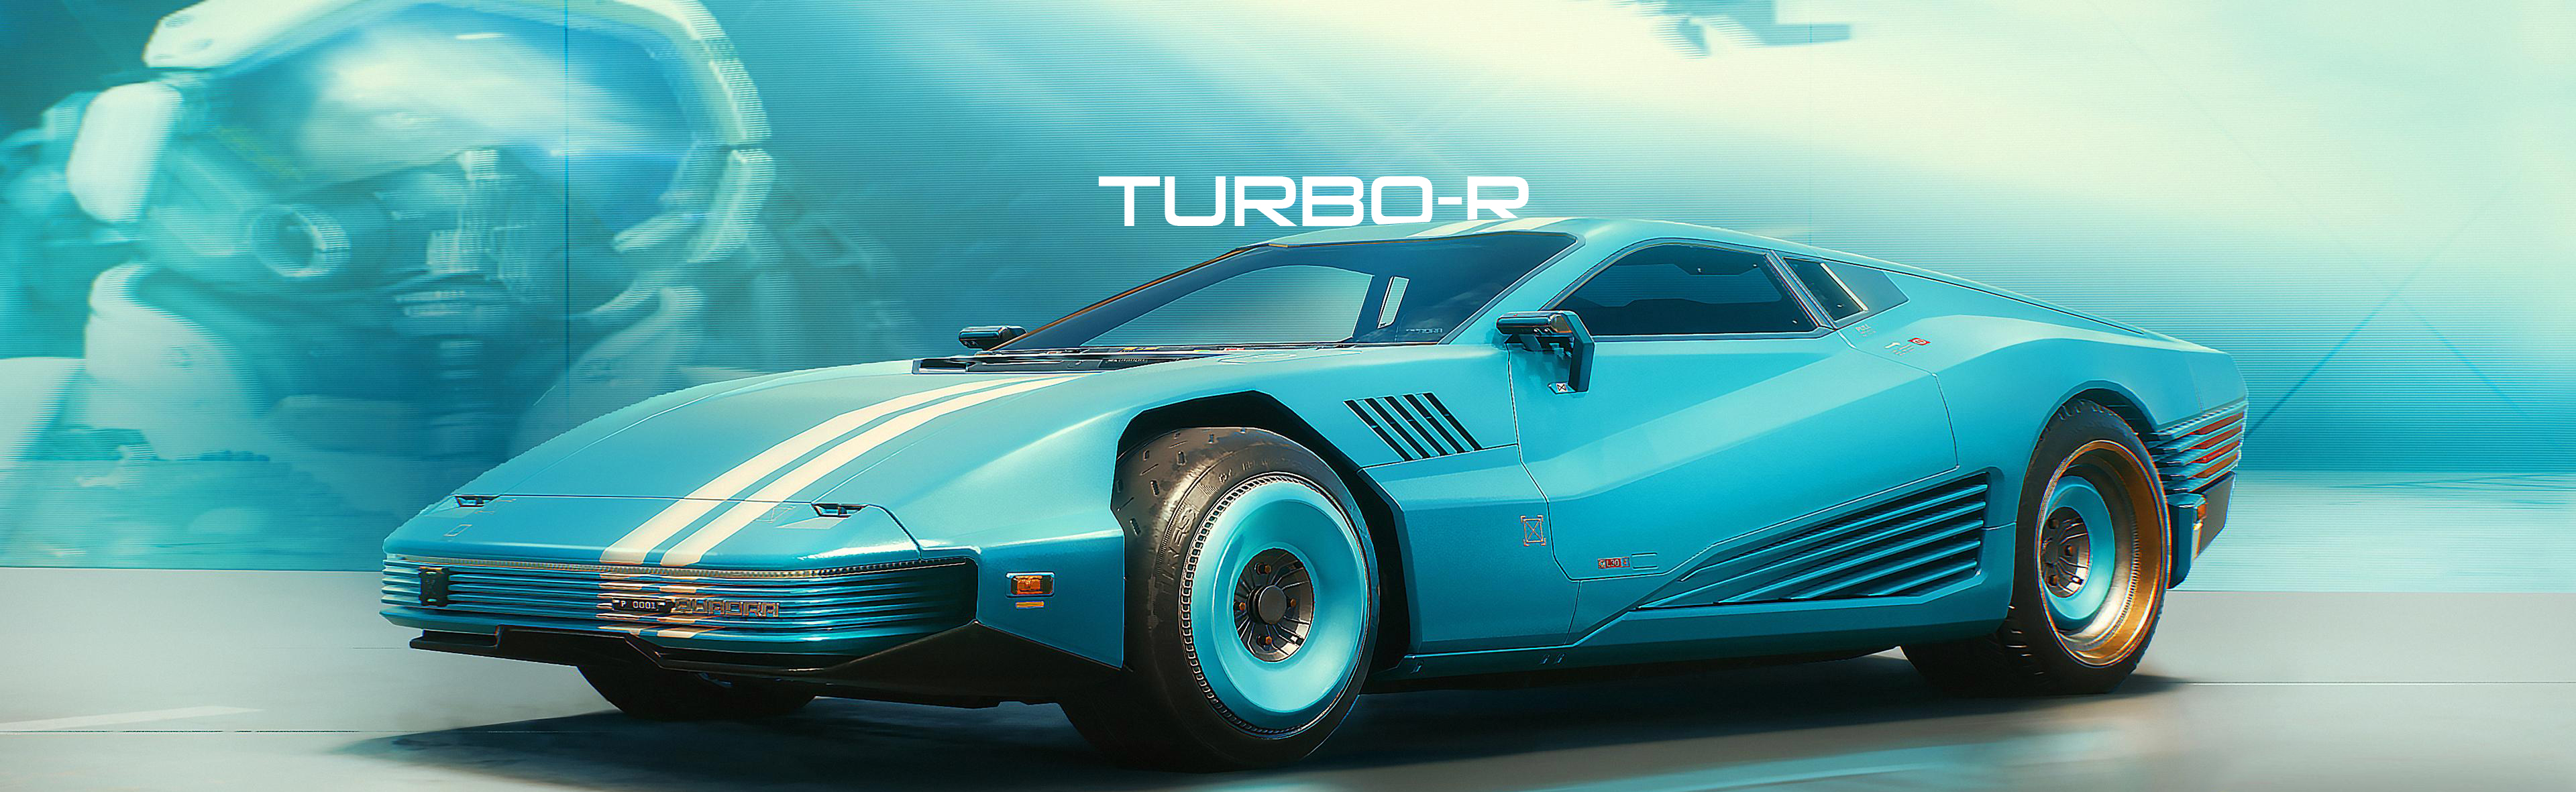 TURBO-R.jpg